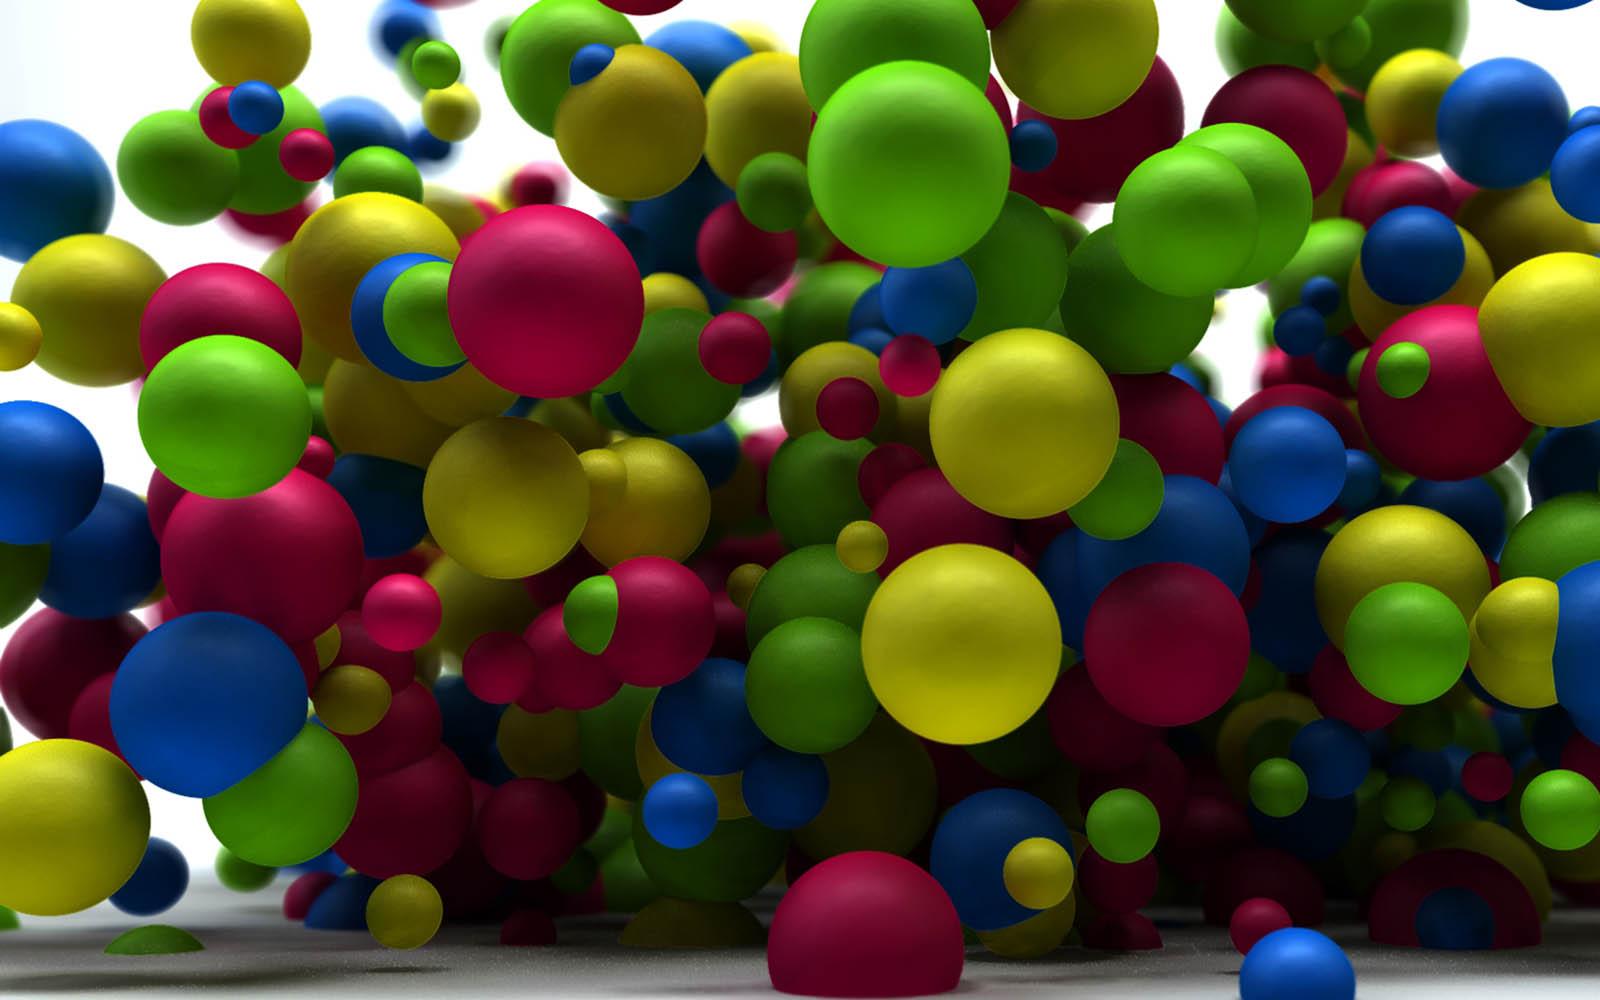 <b>wallpaper</b>: Abstract Balls <b>Wallpapers</b>